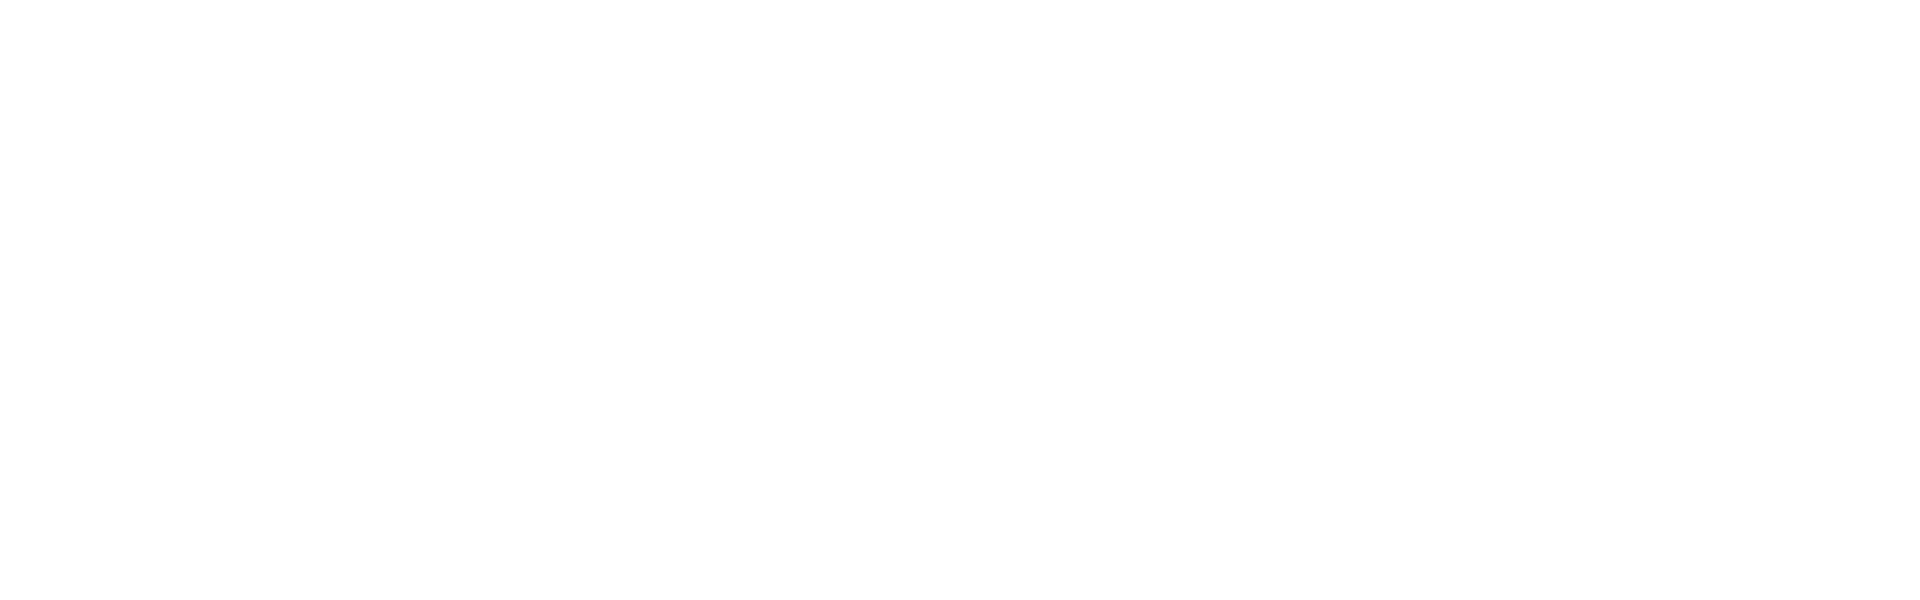 Evosonic-Header-Service